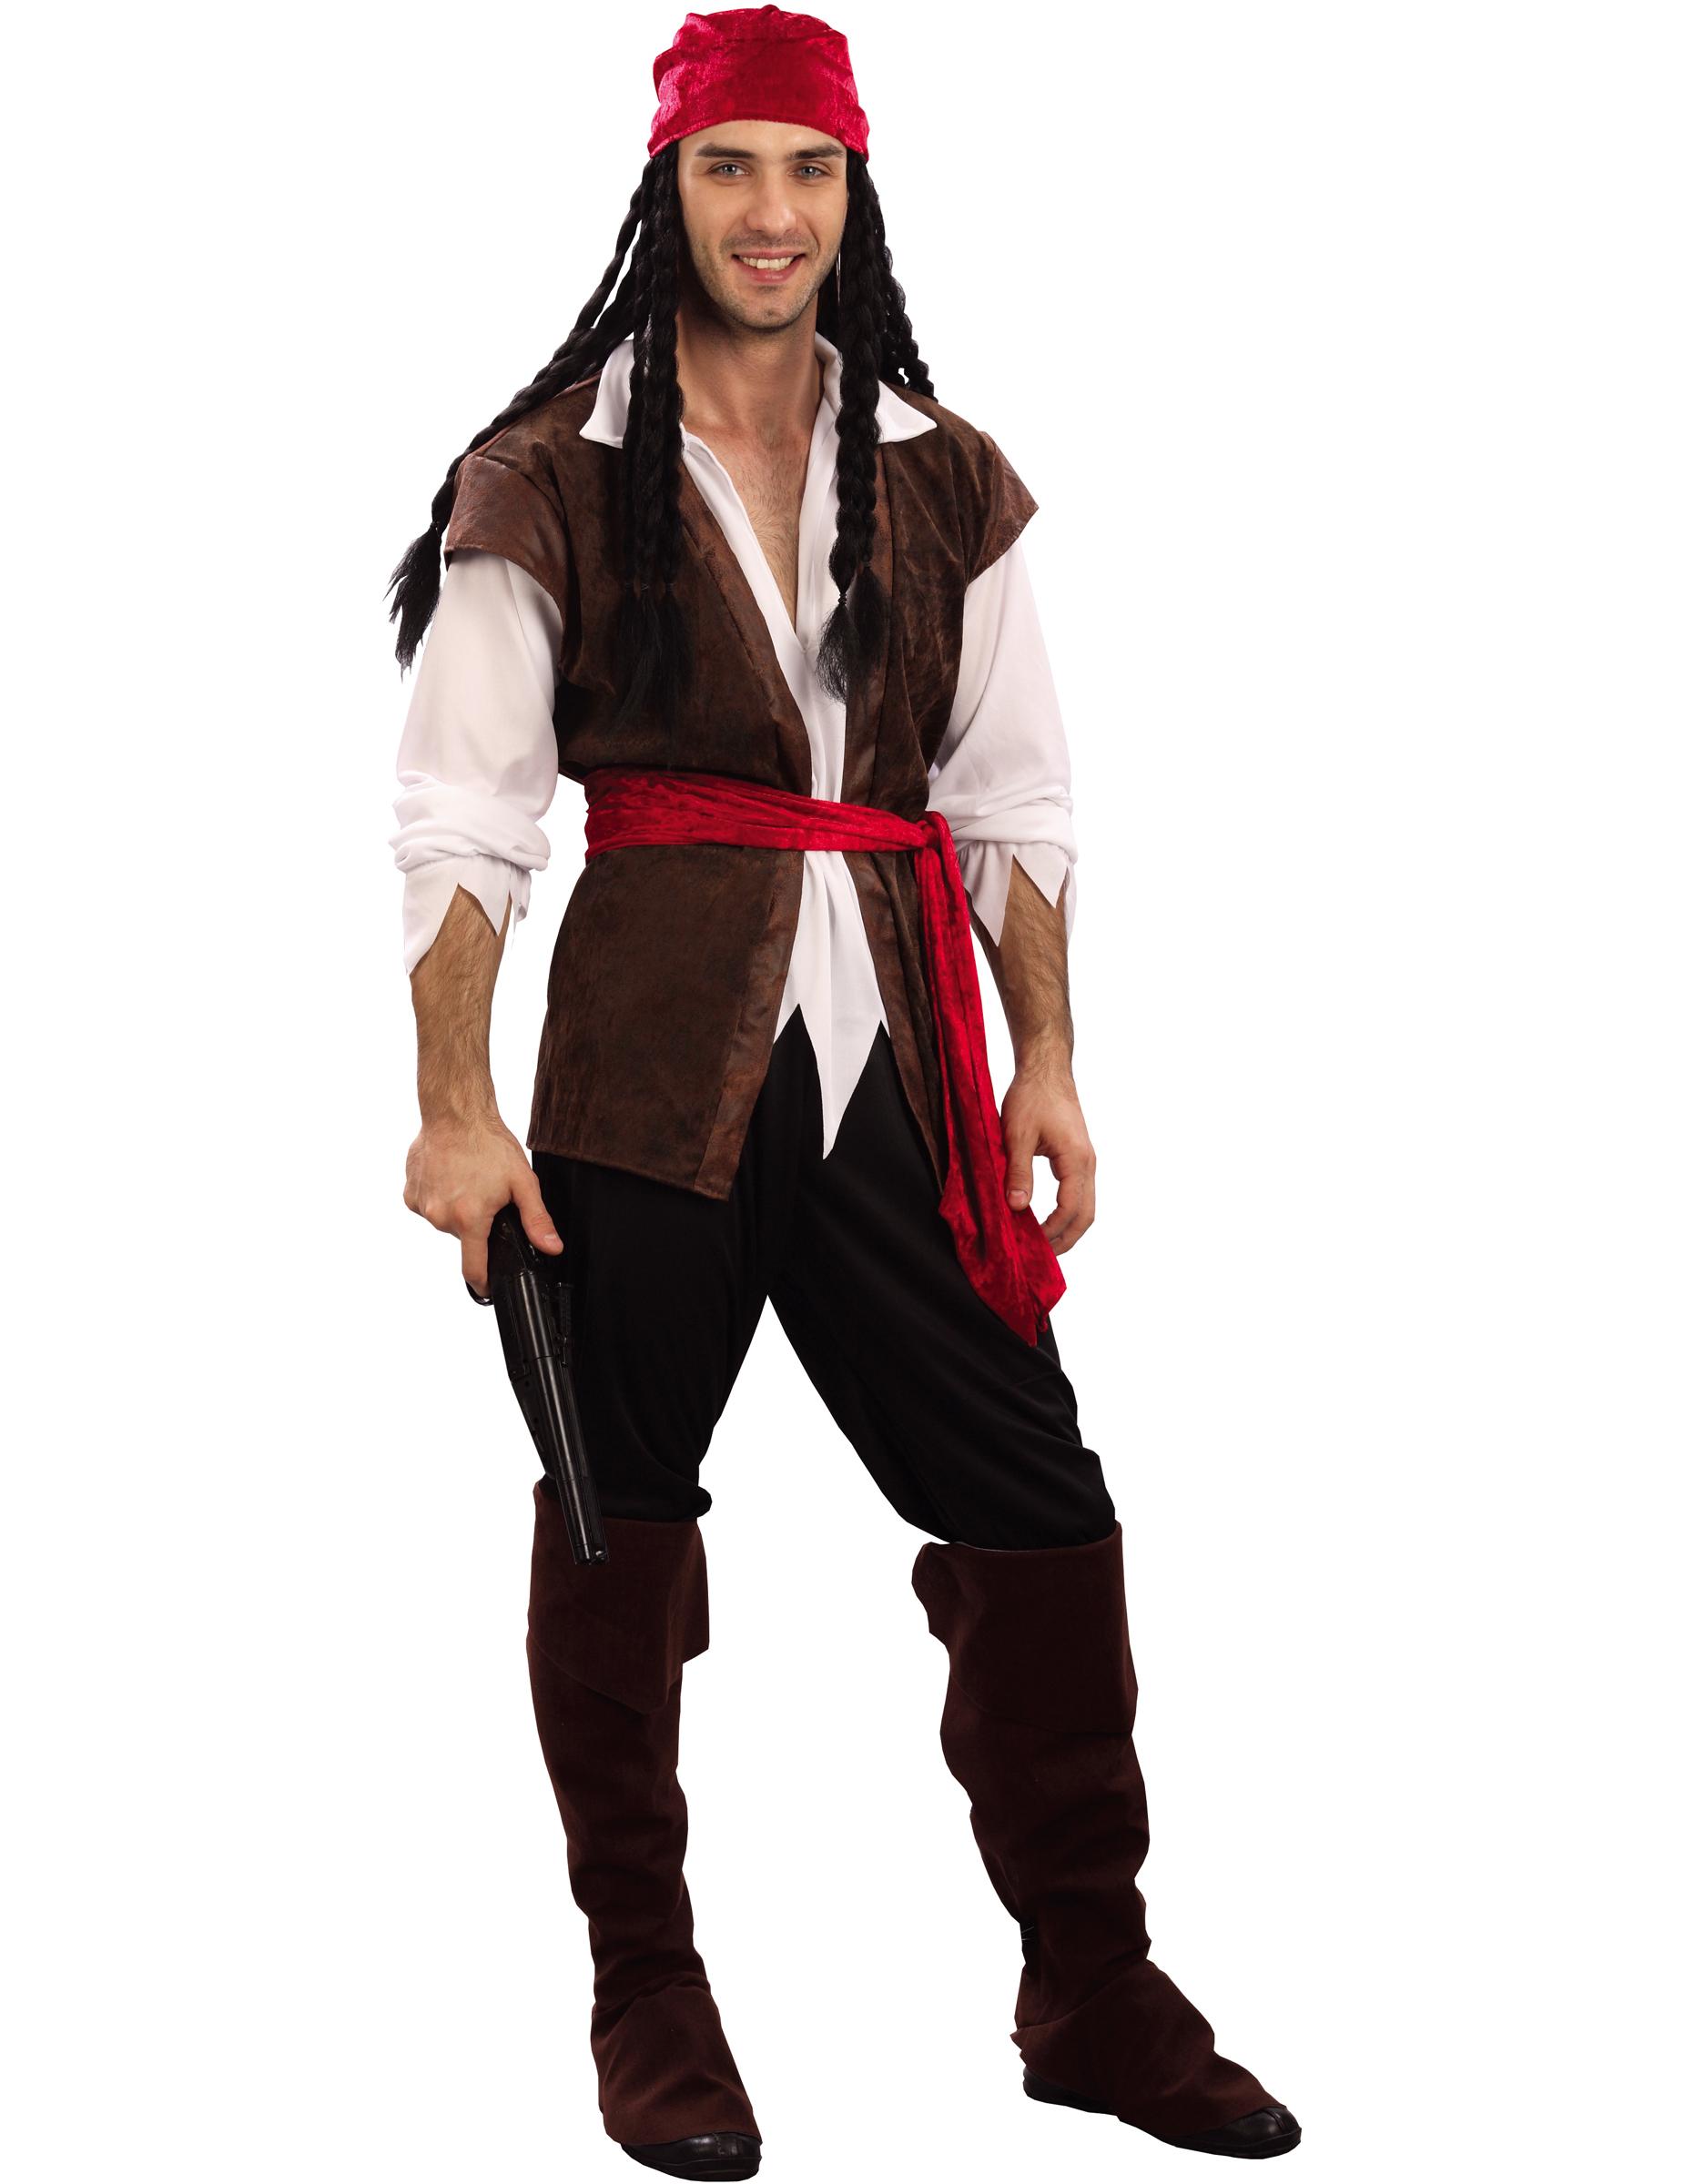 Disfraz Casero de Pirata Para Hombre Disfraz de Hombre Pirata